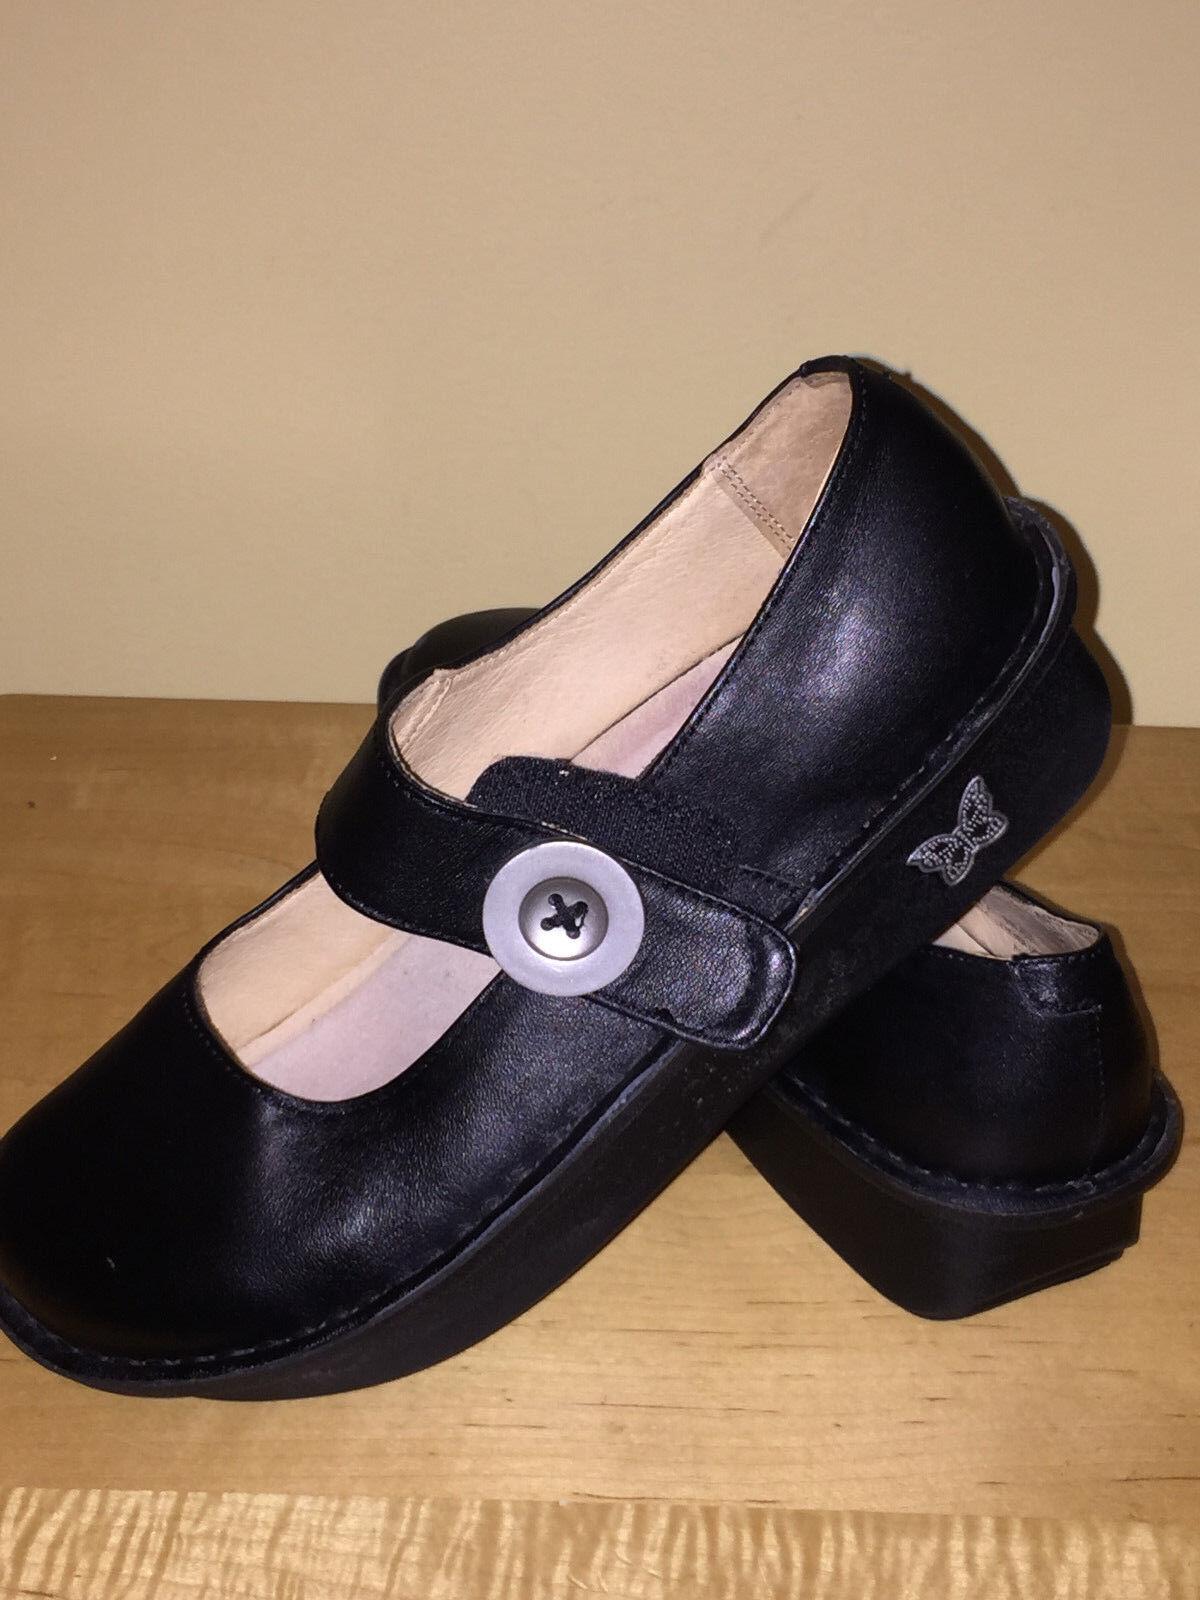 Alegria PAL-601 PAL-601 PAL-601 (Black Leather Mary Janes) Women's Size 38 U.S. Size 8-8.5 df54e5